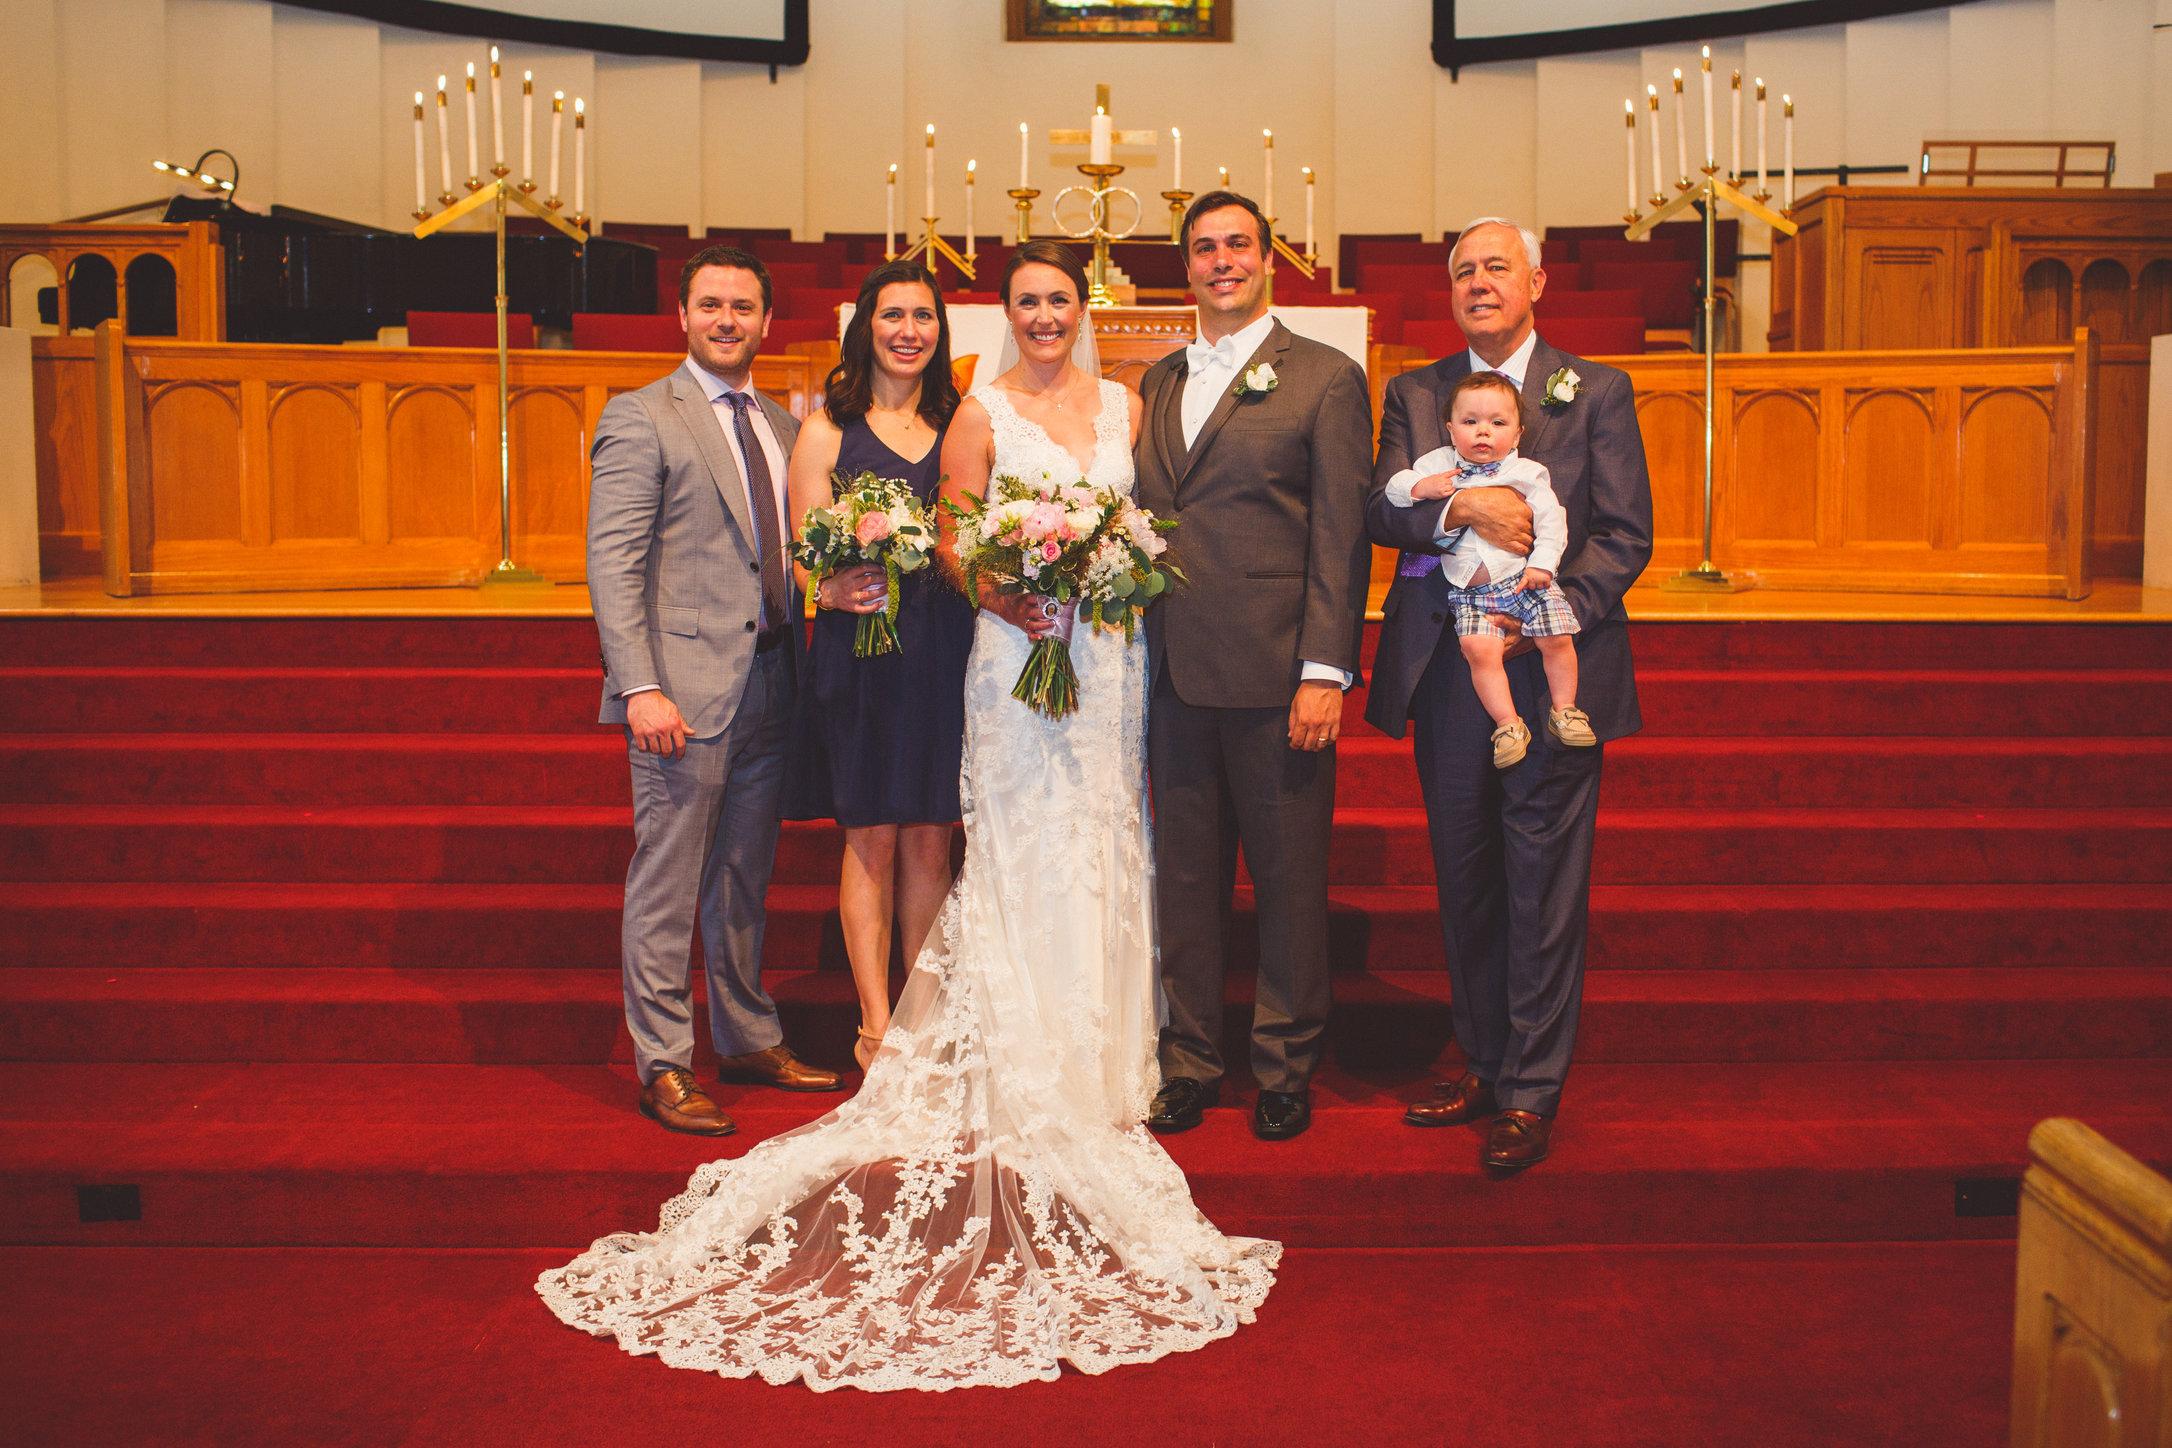 SandC-wedding-256.jpg